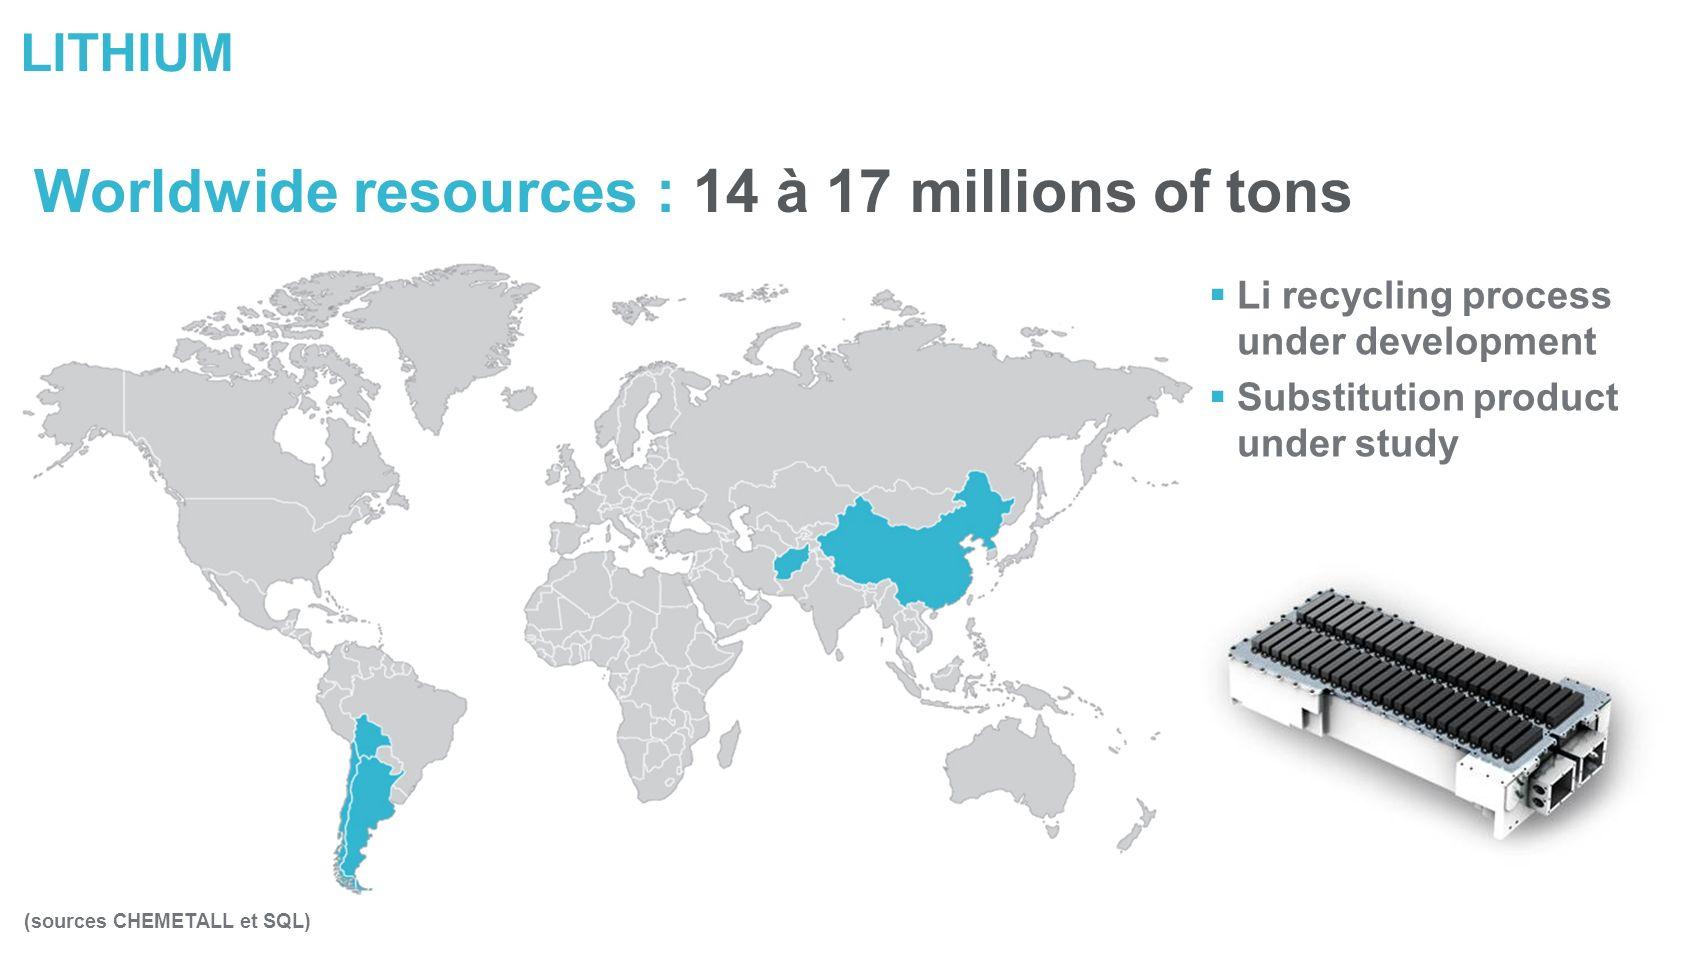 LITHIUM Worldwide resources : 14 à 17 millions of tons (sources CHEMETALL et SQL) Li recycling process under development Substitution product under st